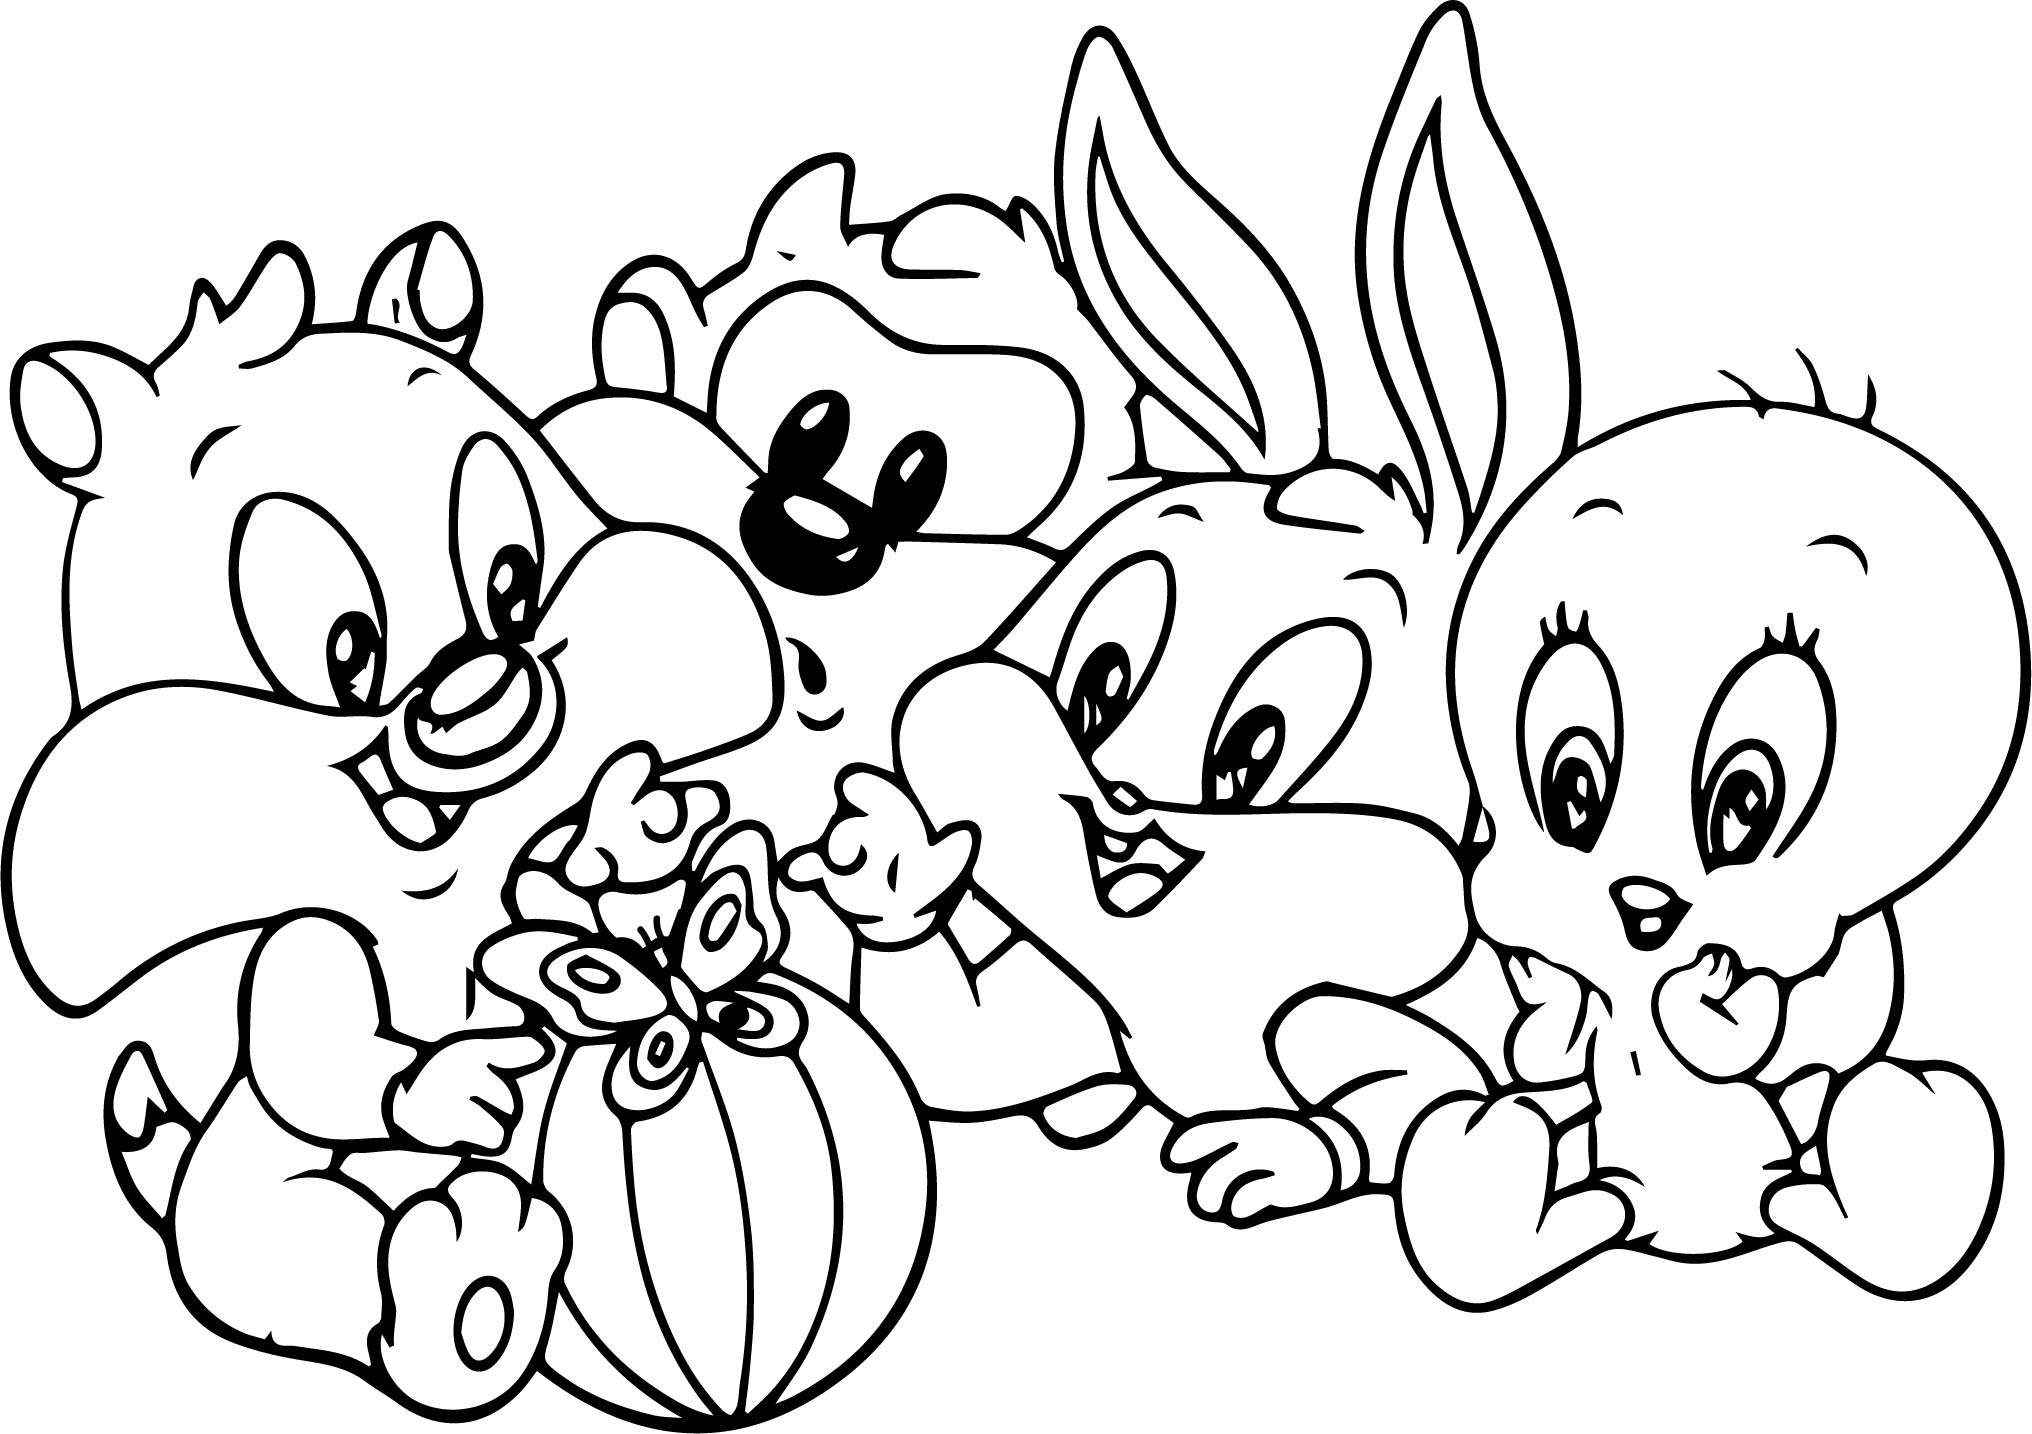 Looney Tune Drawing At Getdrawings